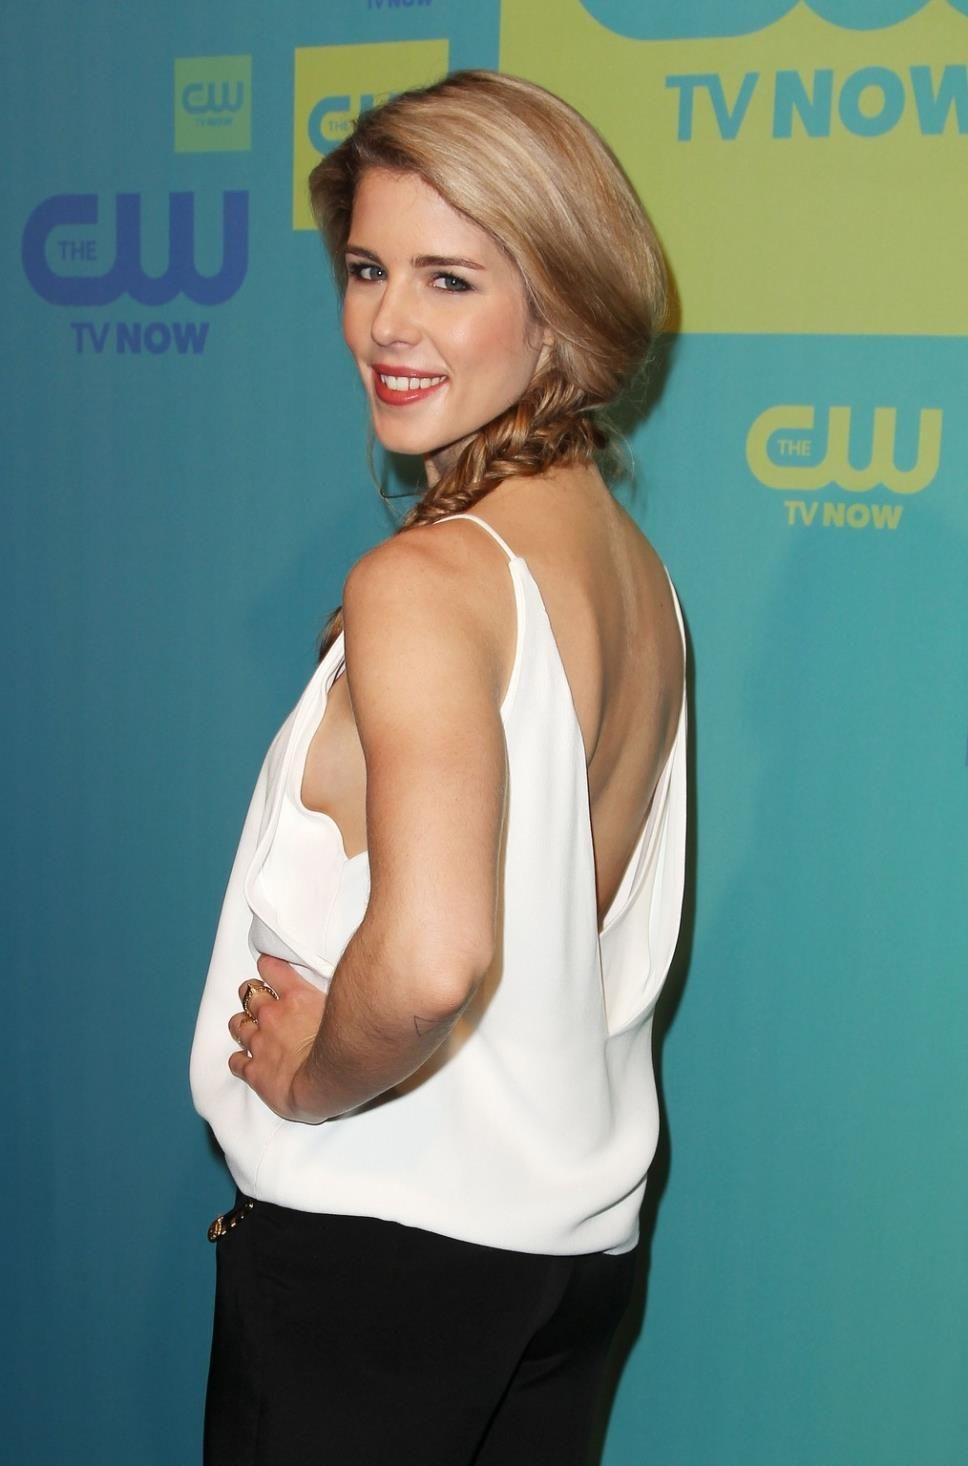 Amanda Tapping Boobs pinpaul smith on actresses | emily bett rickards bikini